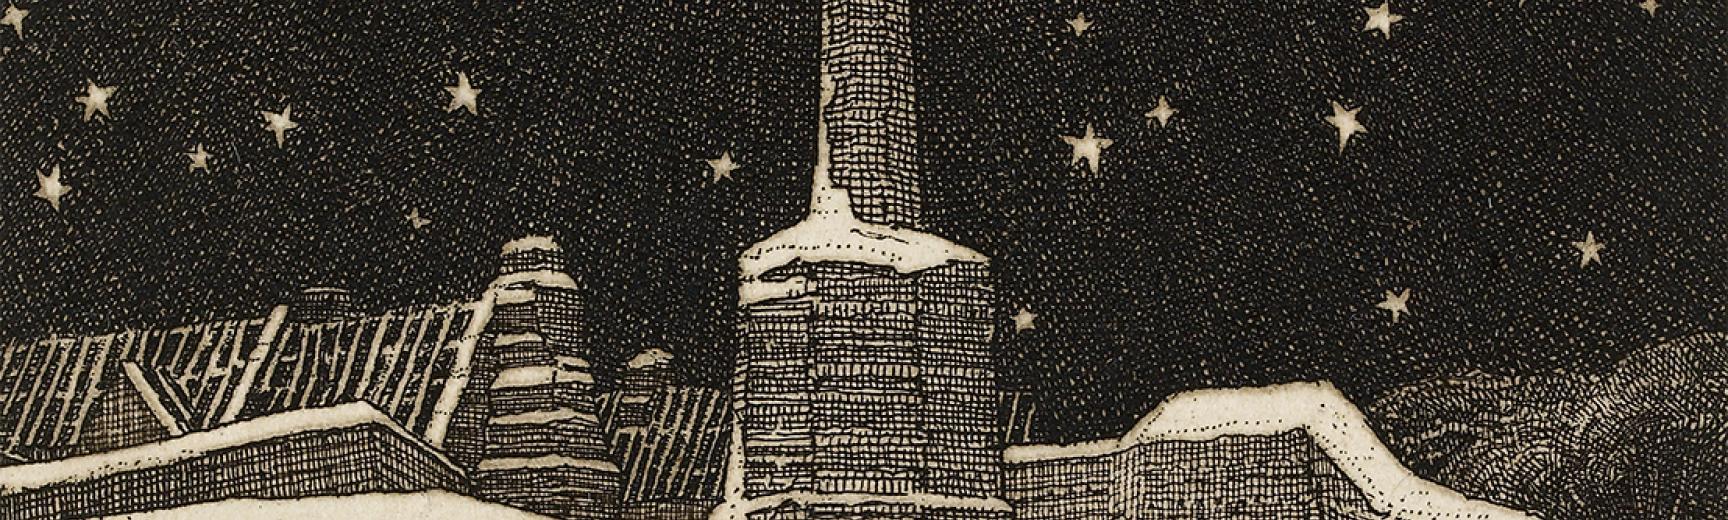 WA1962.54.65 Epiphany, Frederick Landseer Maur Griggs